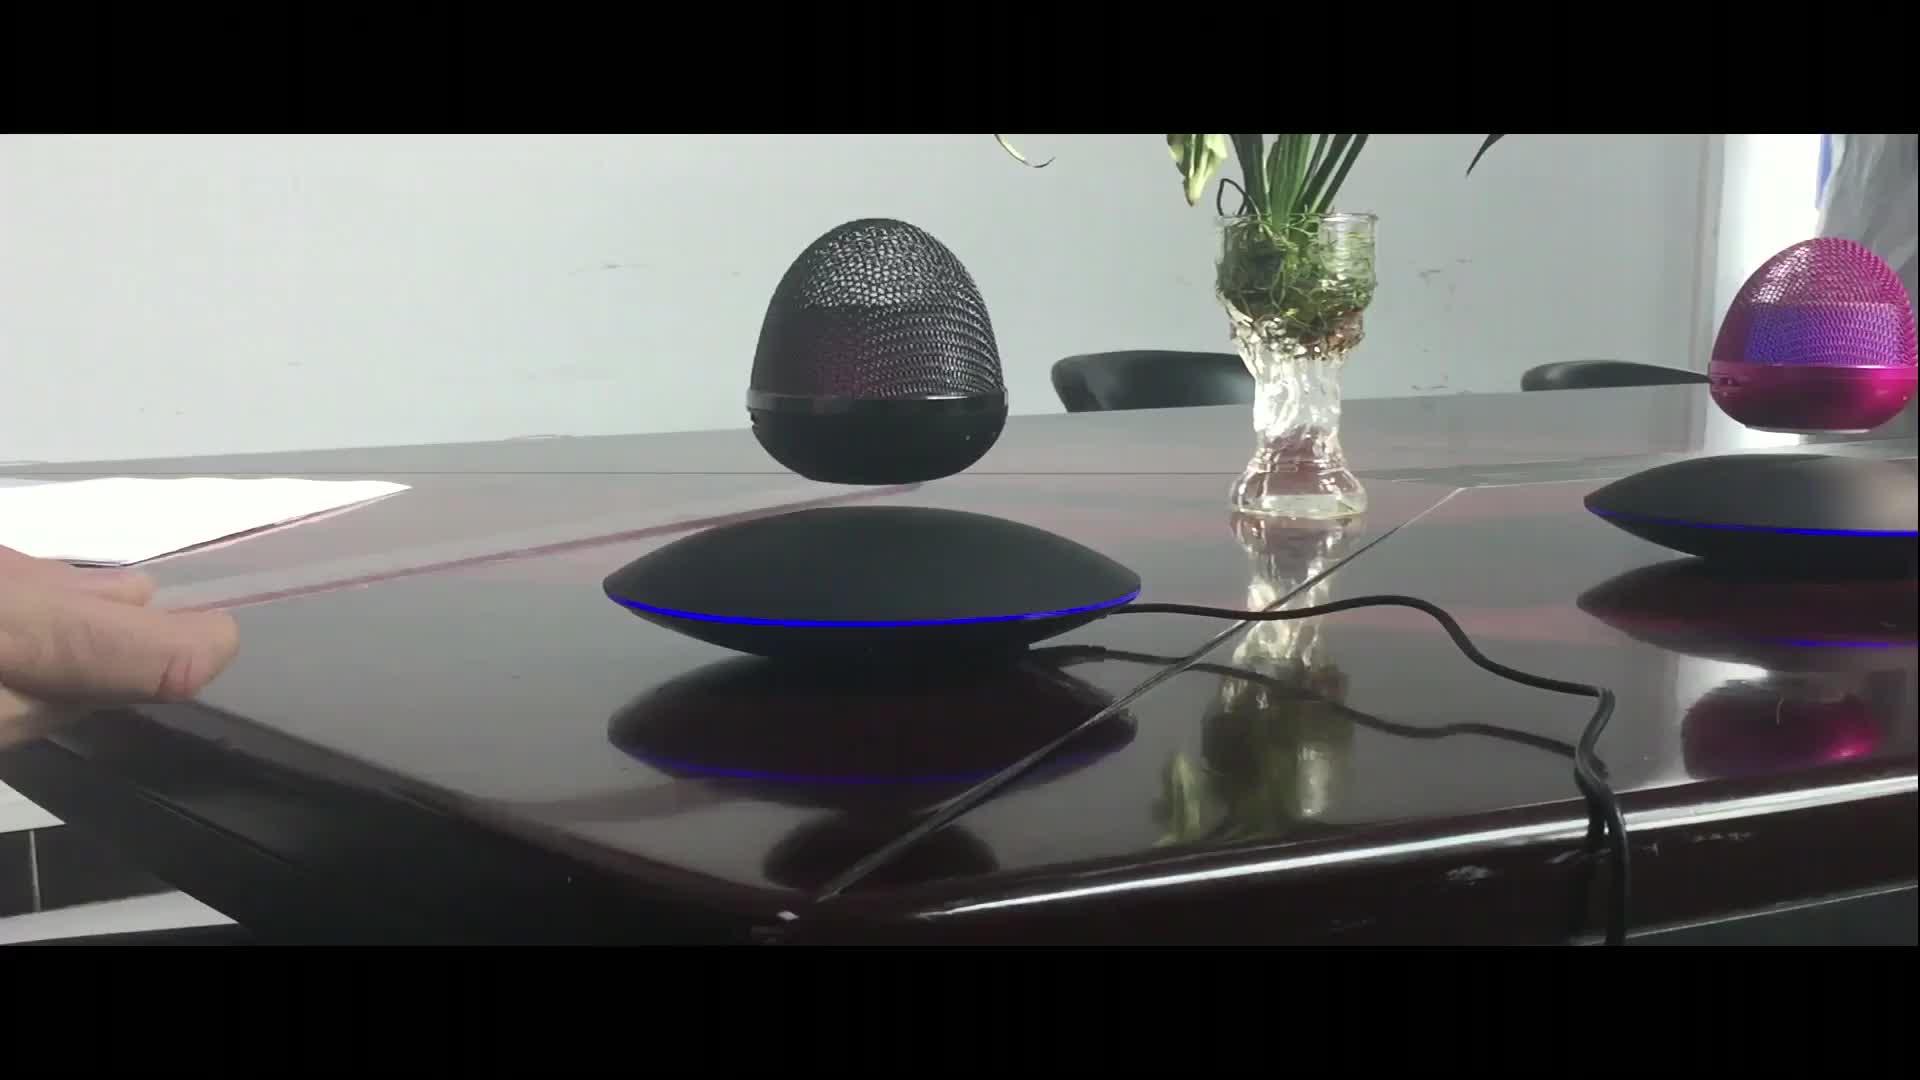 Outdoor Led Portable Bluetooth Speaker levitating